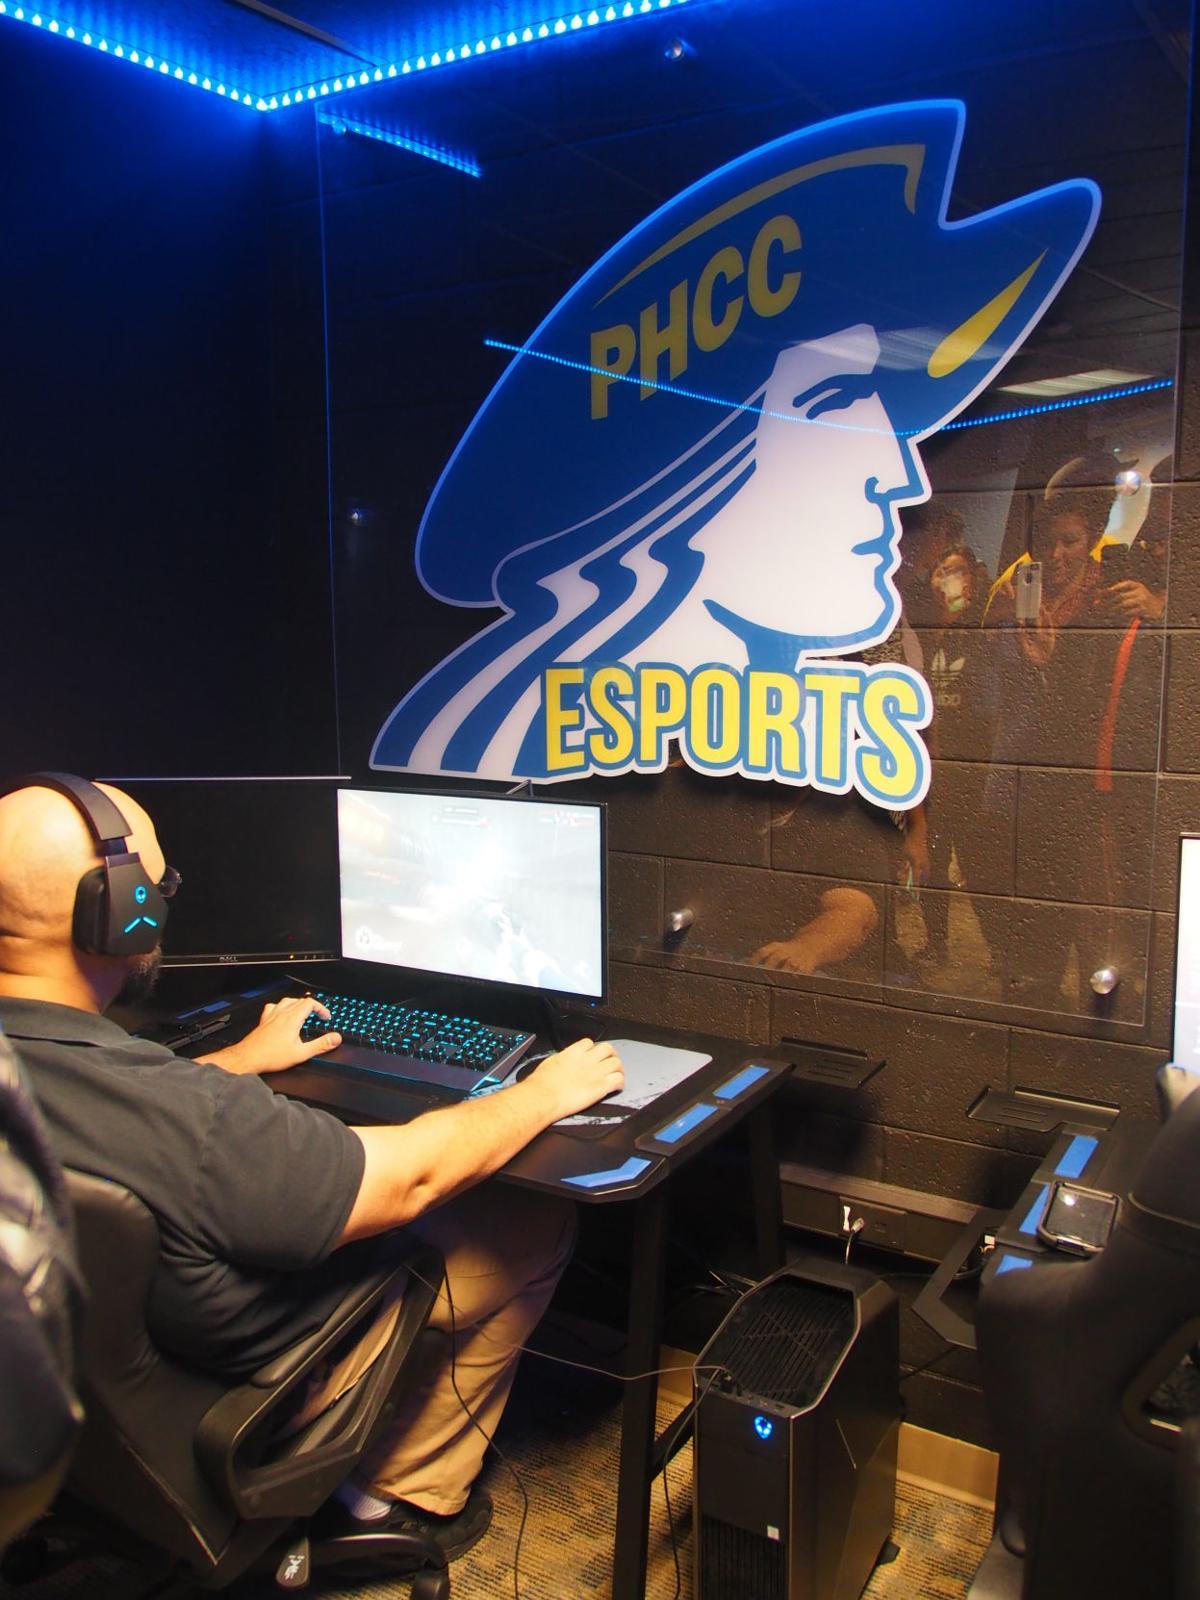 PHCC eSports